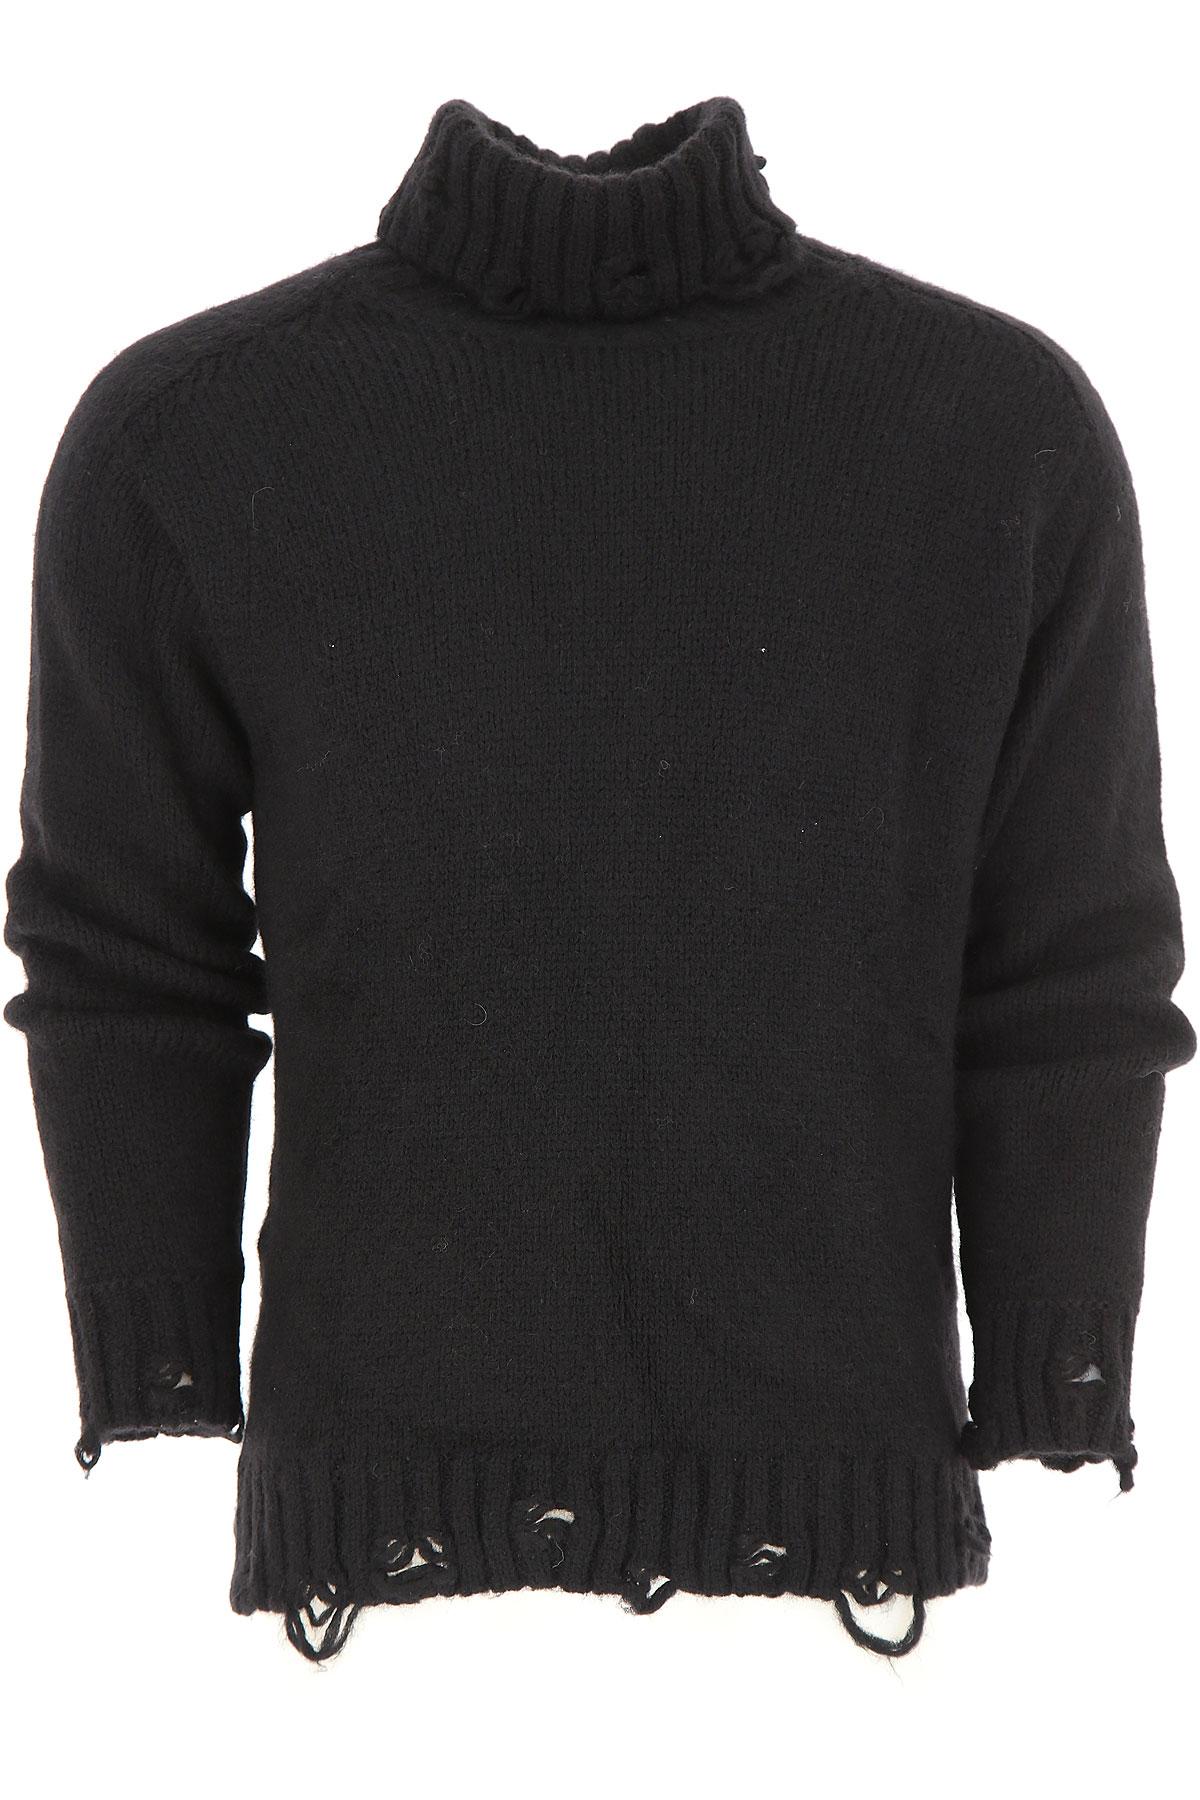 Image of Maison Flaneur Mens Clothing, Black, alpaca, 2017, 30 32 34 36